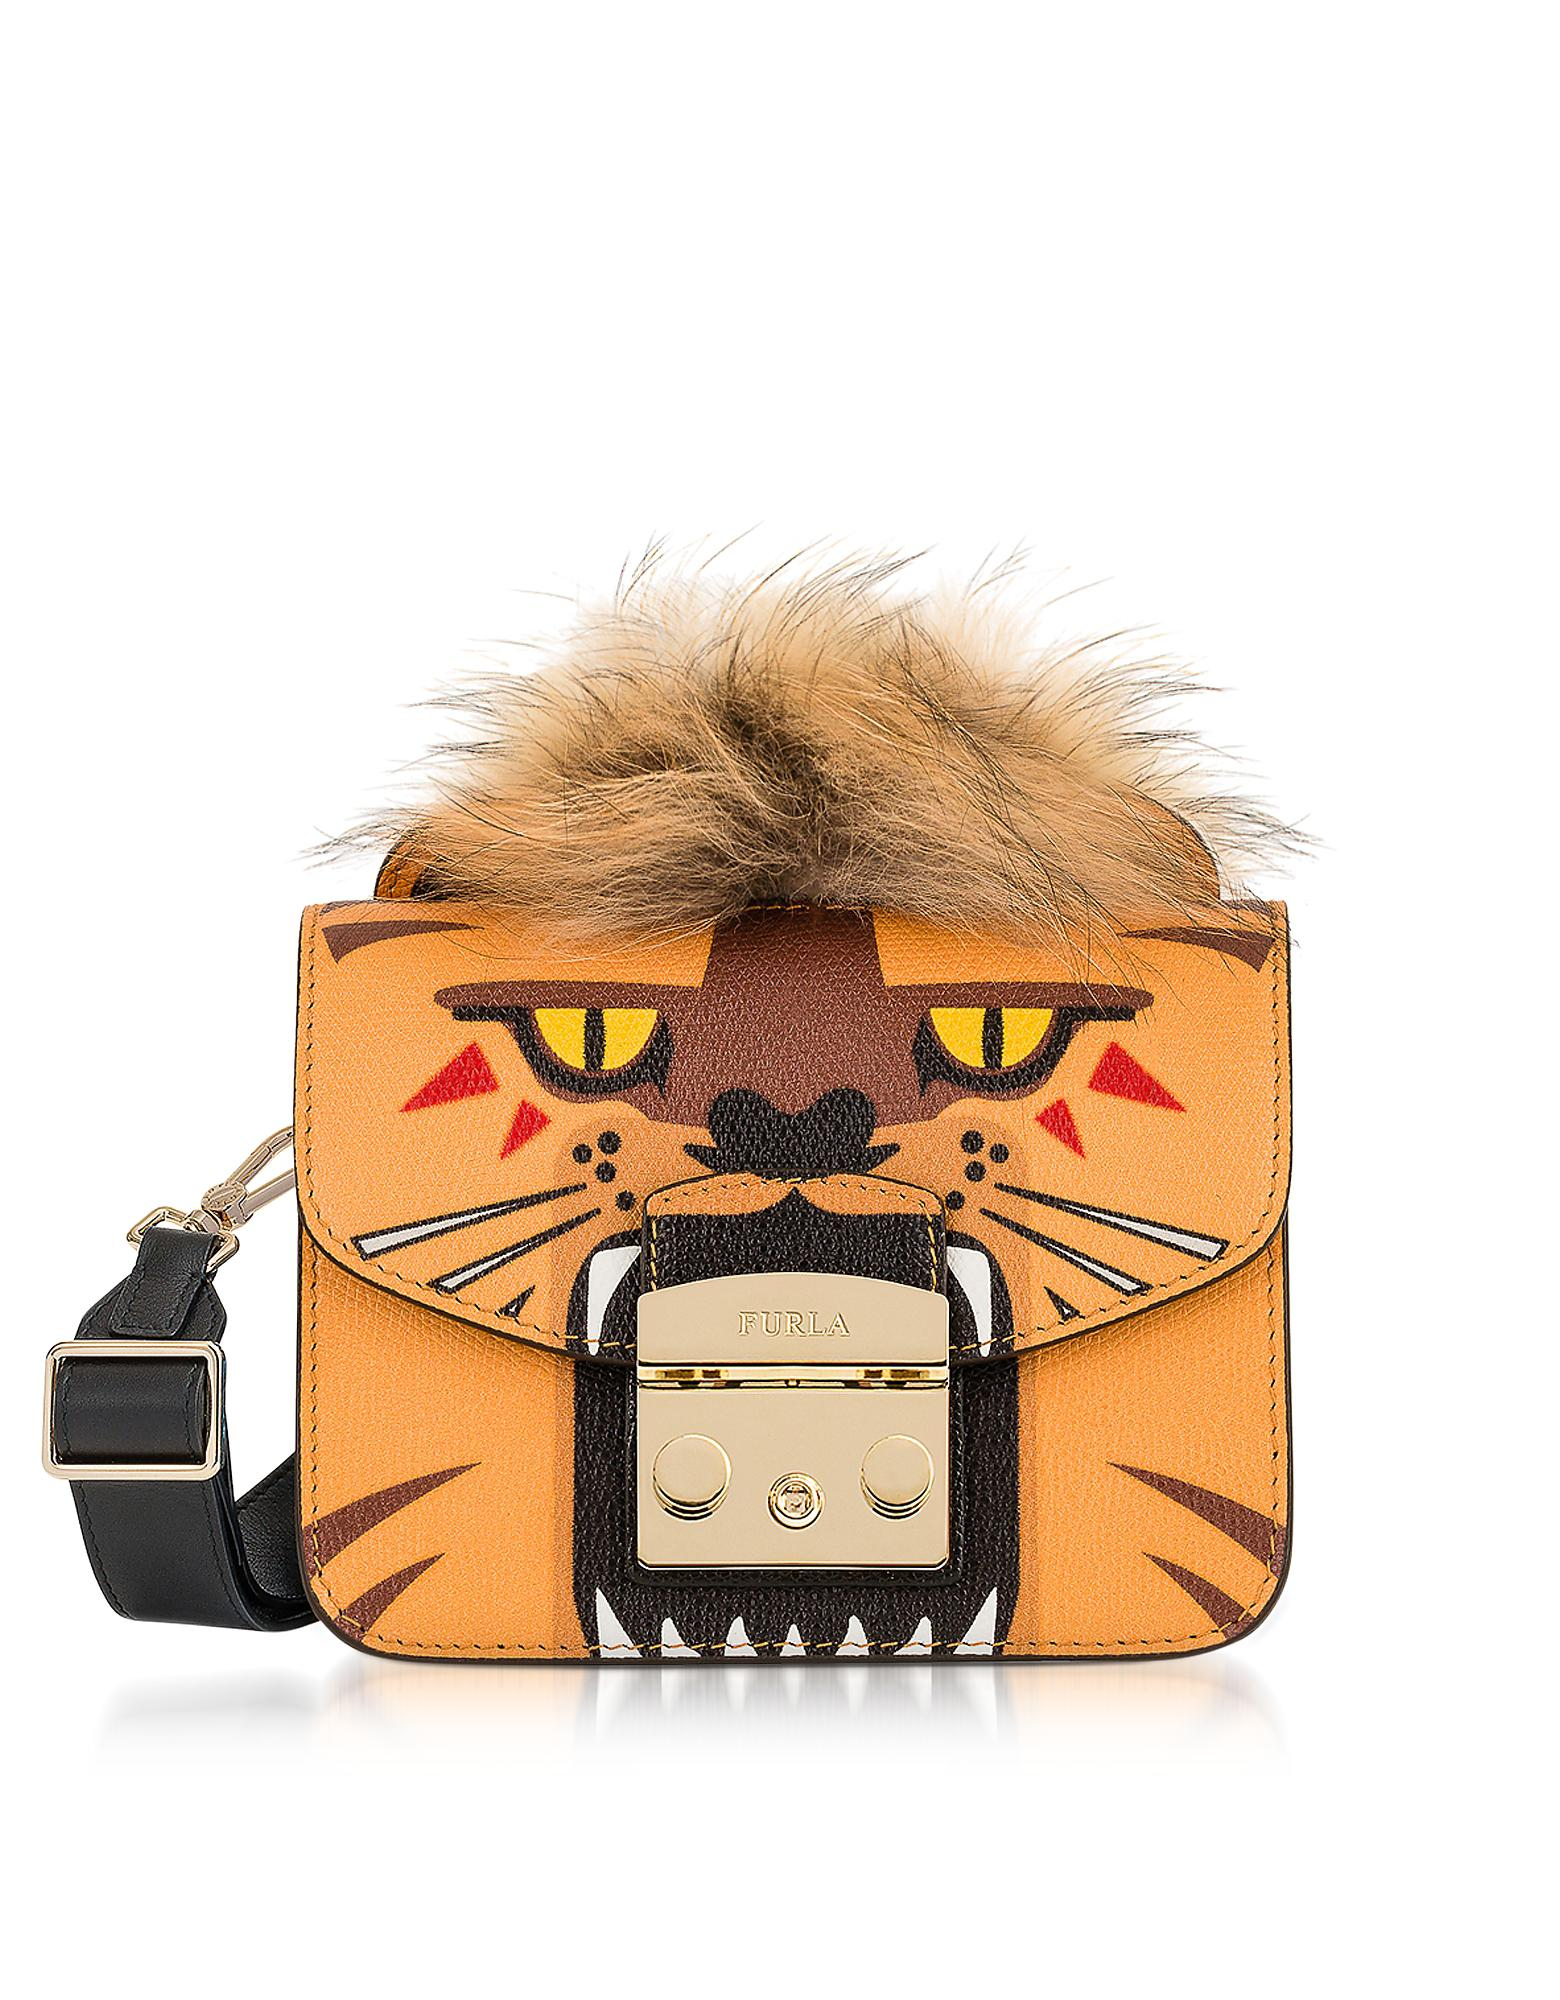 Lyst - Furla Metropolis Jungle Leo Mini Crossbody Bag in Orange a1023c7b3ff10